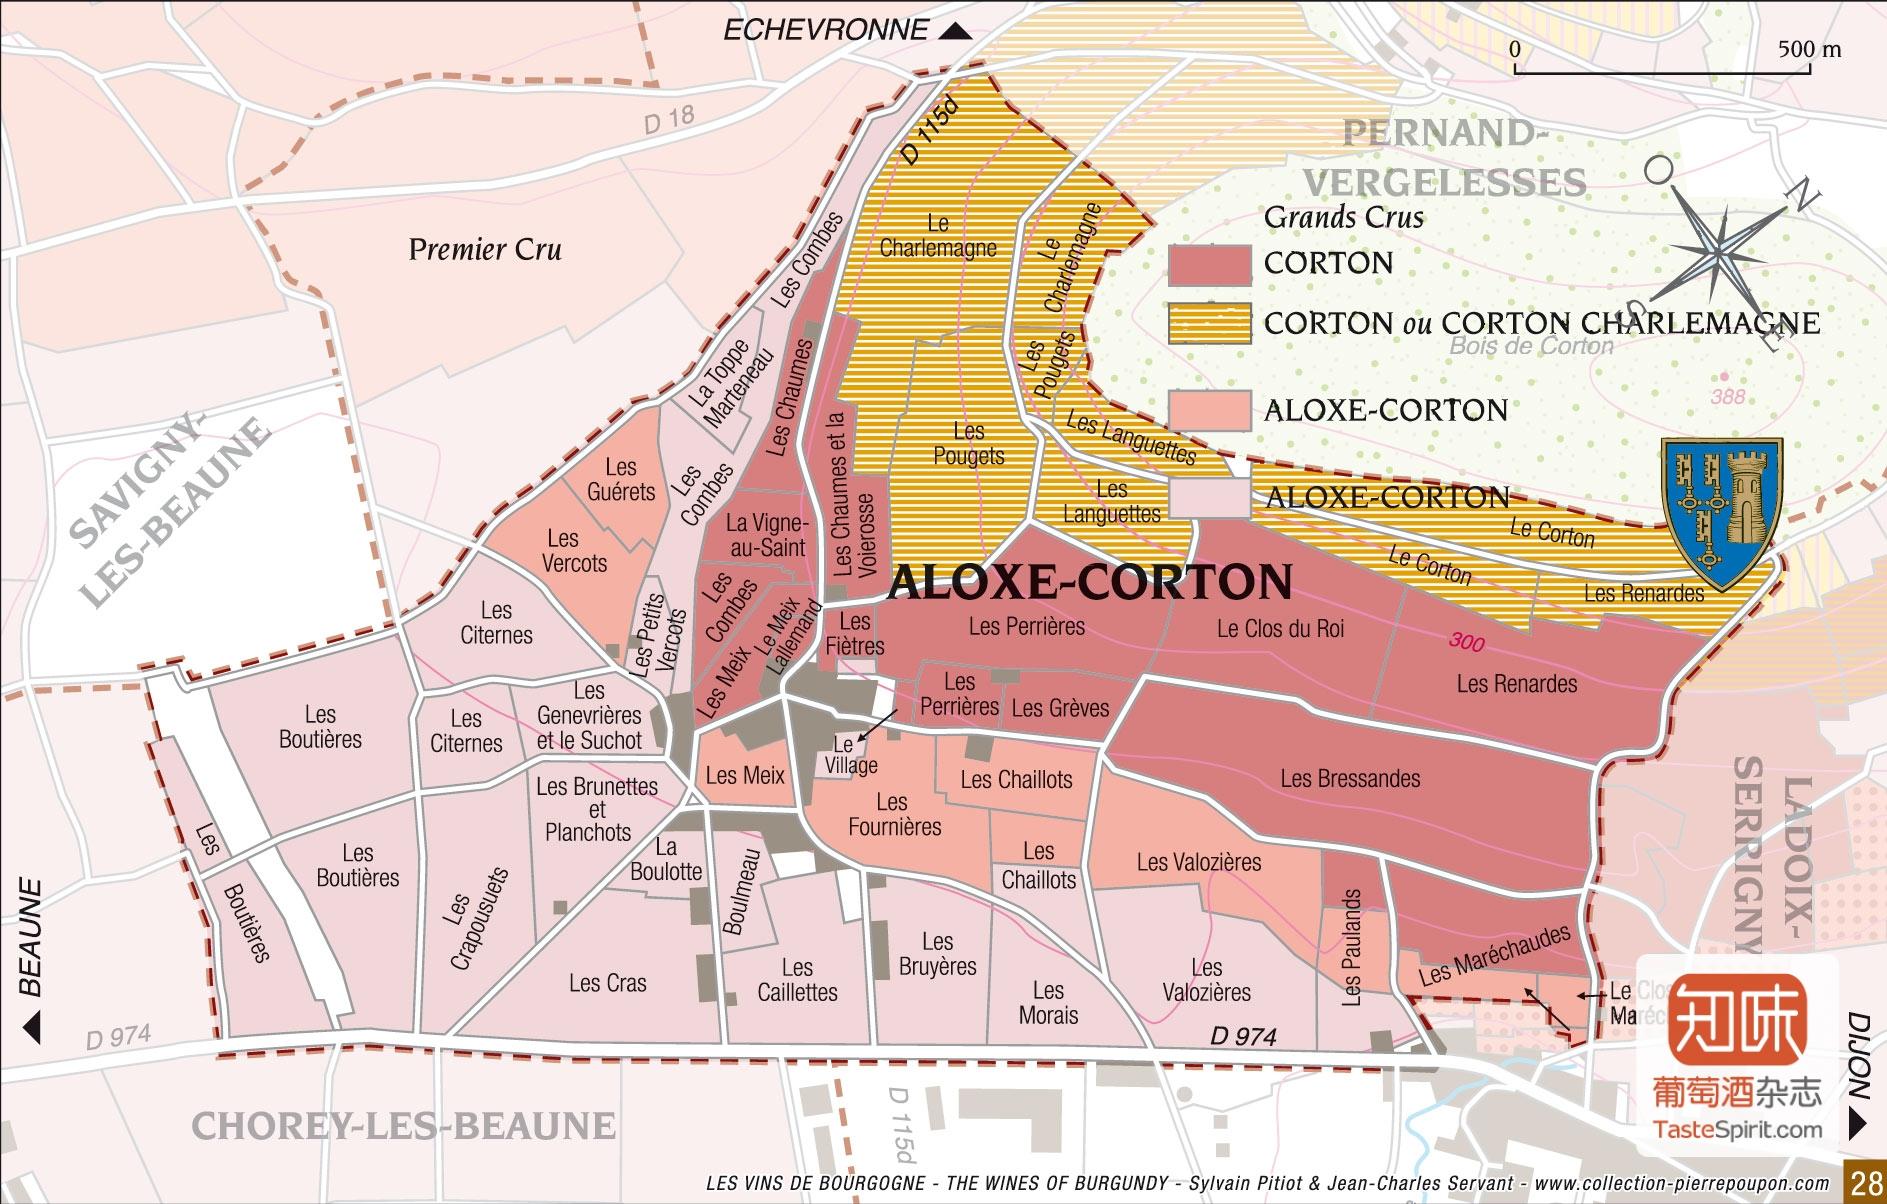 Aloxe-Corton产区图,白色为白葡萄酒分布,点击查看大图